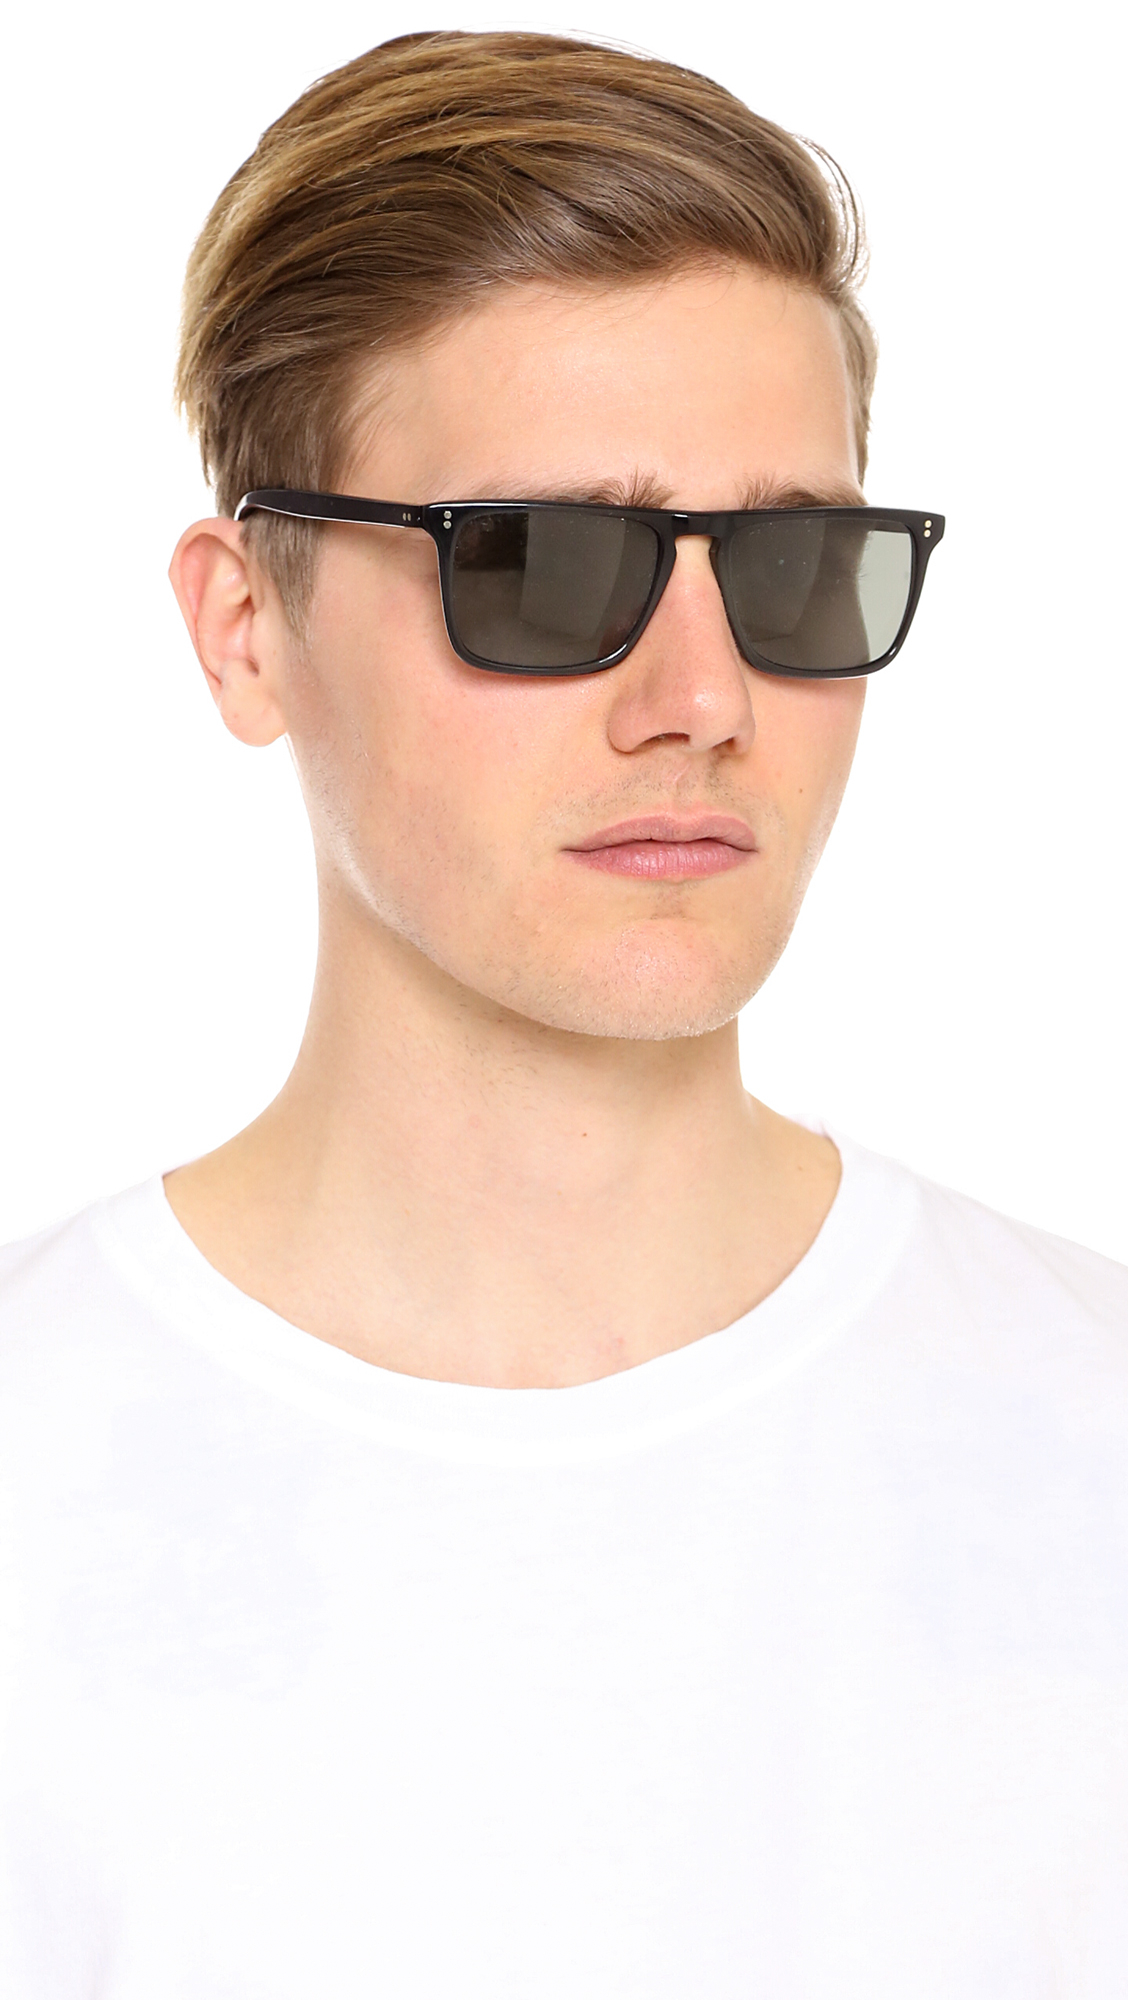 b0ca762e219 Lyst - Oliver Peoples Bernardo Polarized Sunglasses in Black for Men